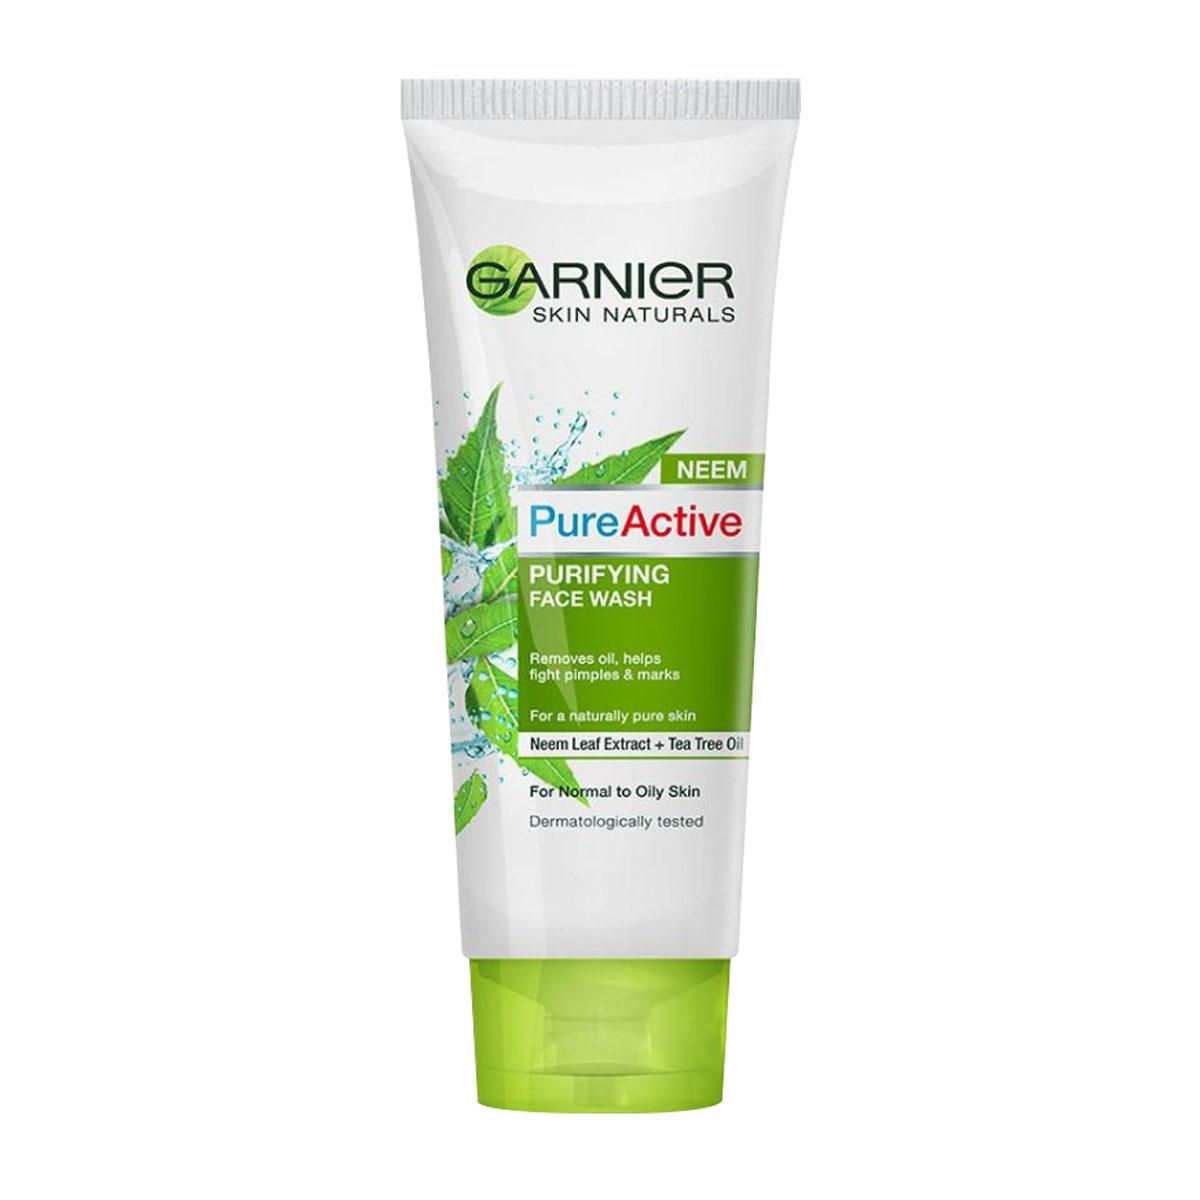 Garnierrak Buy At Best Price In Bangladesh Www Garnier Pure Active Matcha Deep Clean 50ml Purifying Face Wash 100g